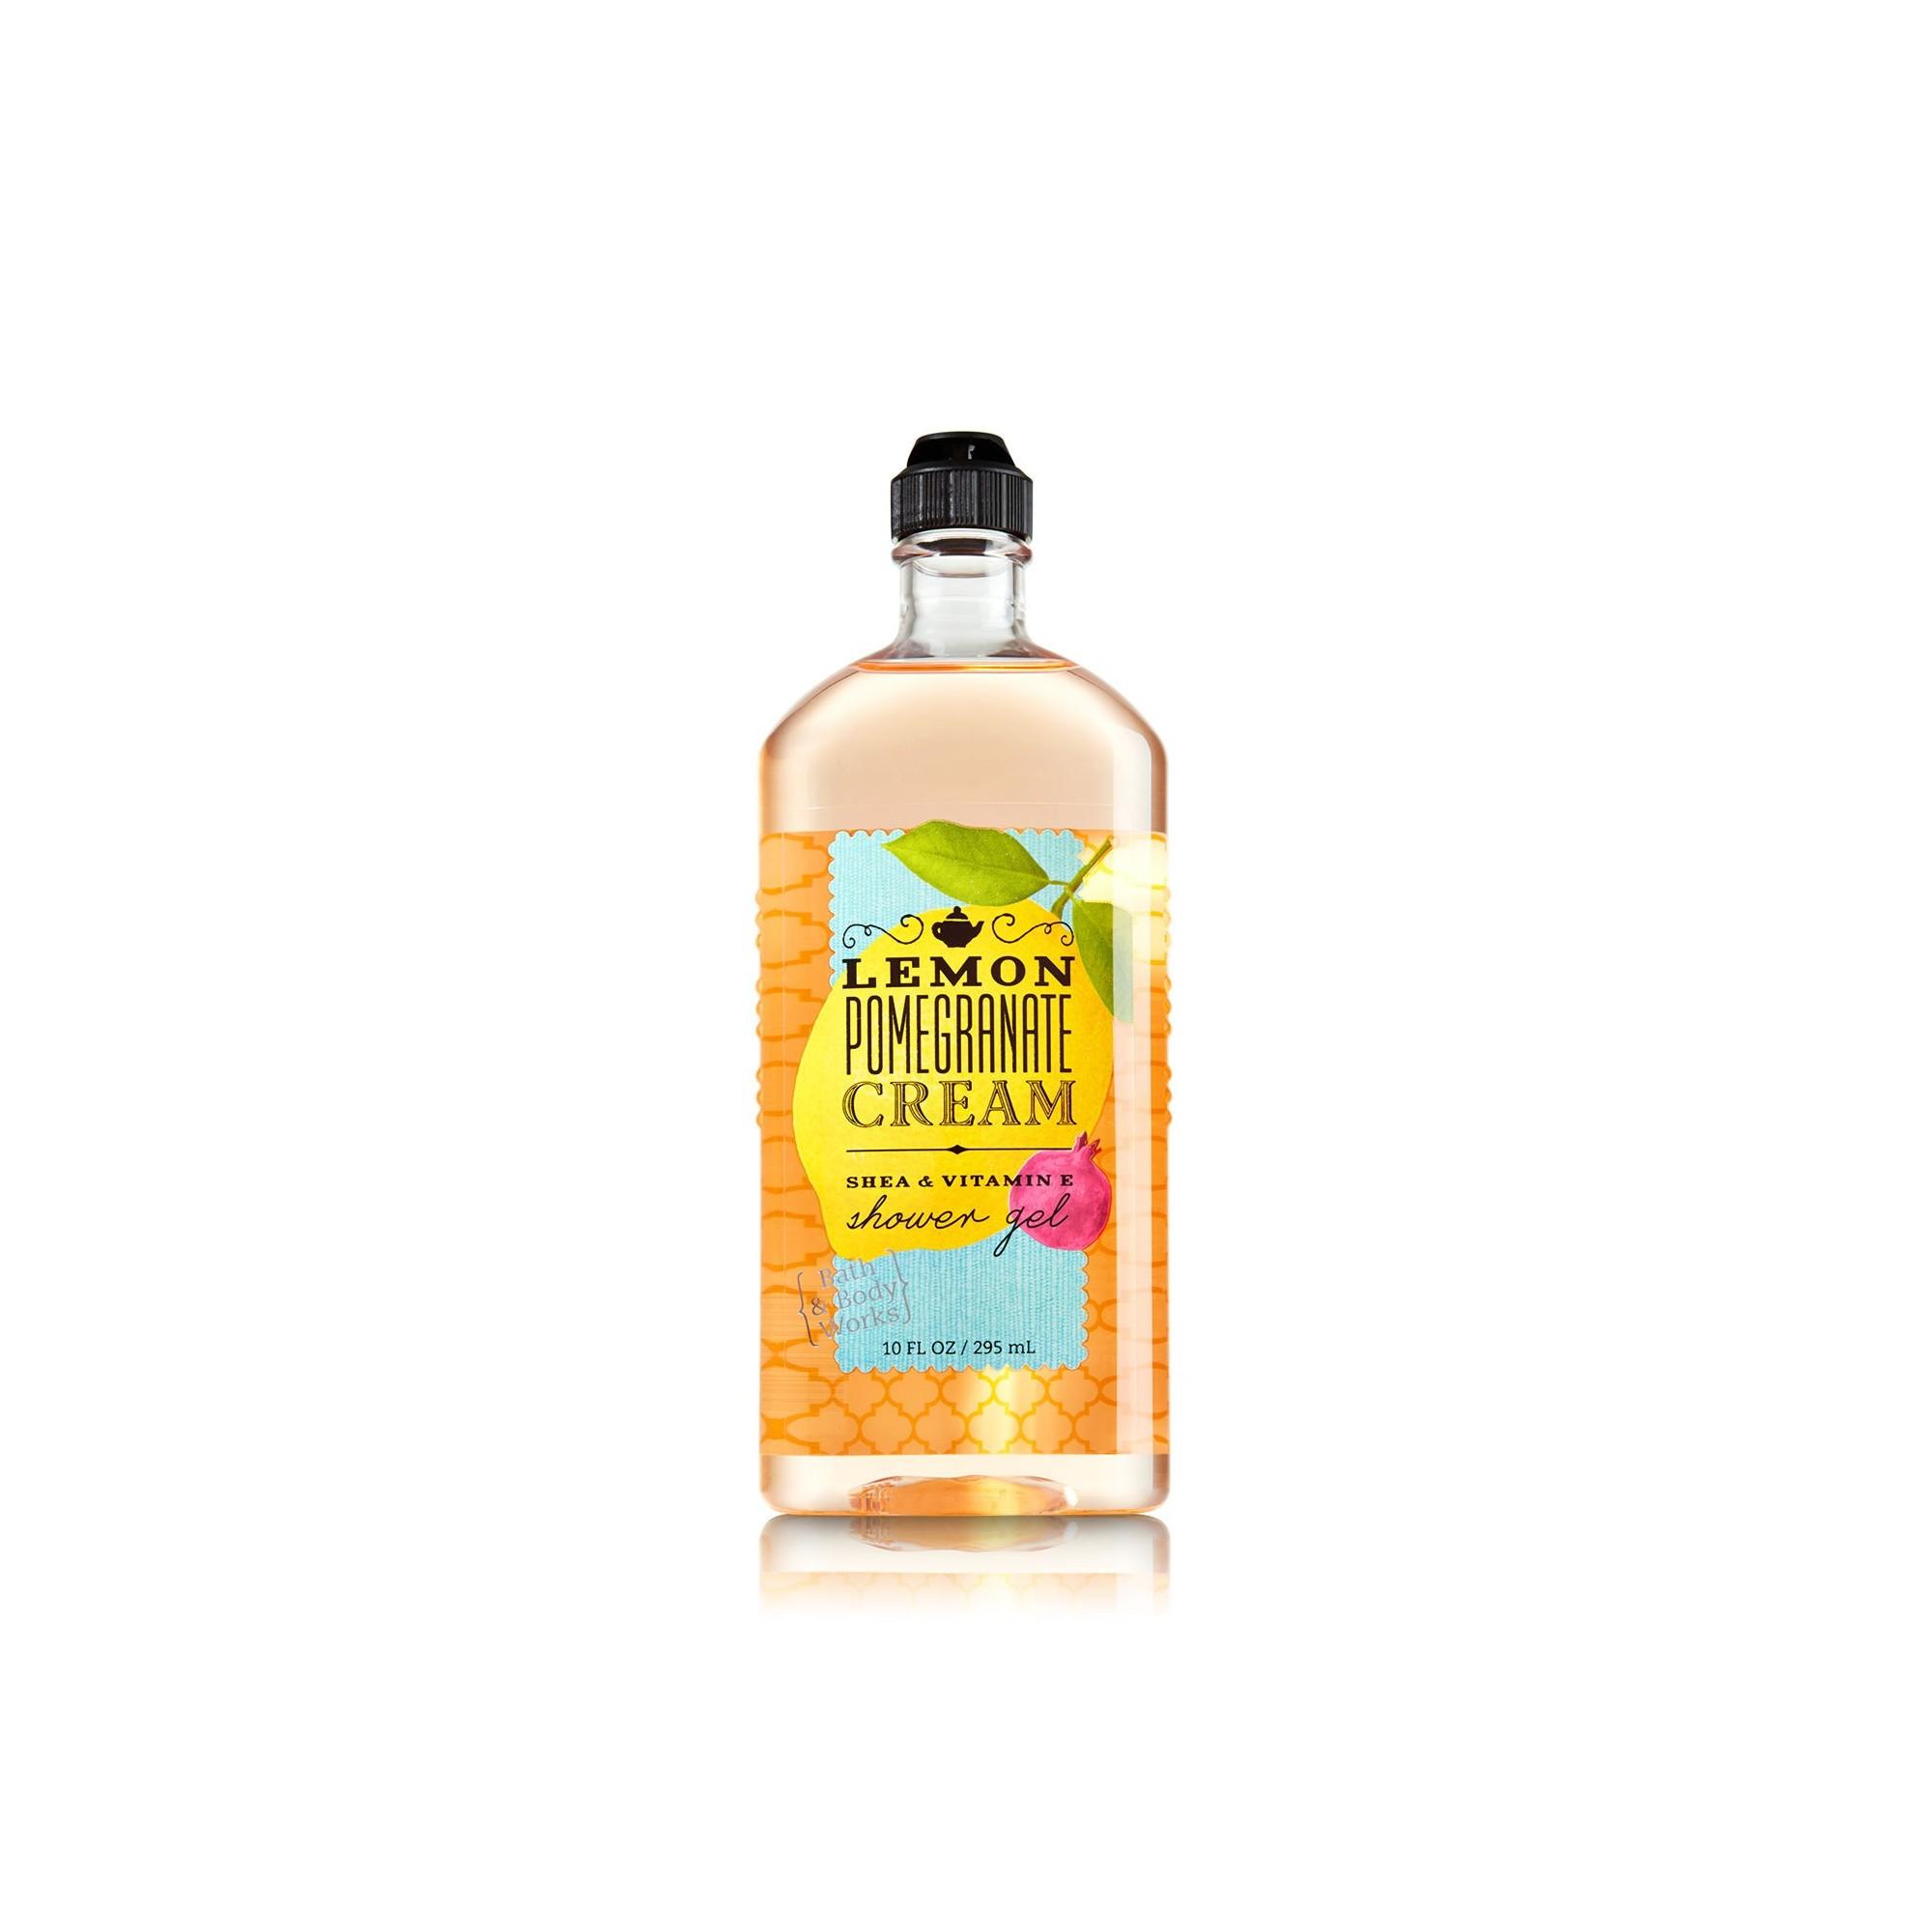 Bath & Body Works Lemon Pomegranate Cream Shower Gel